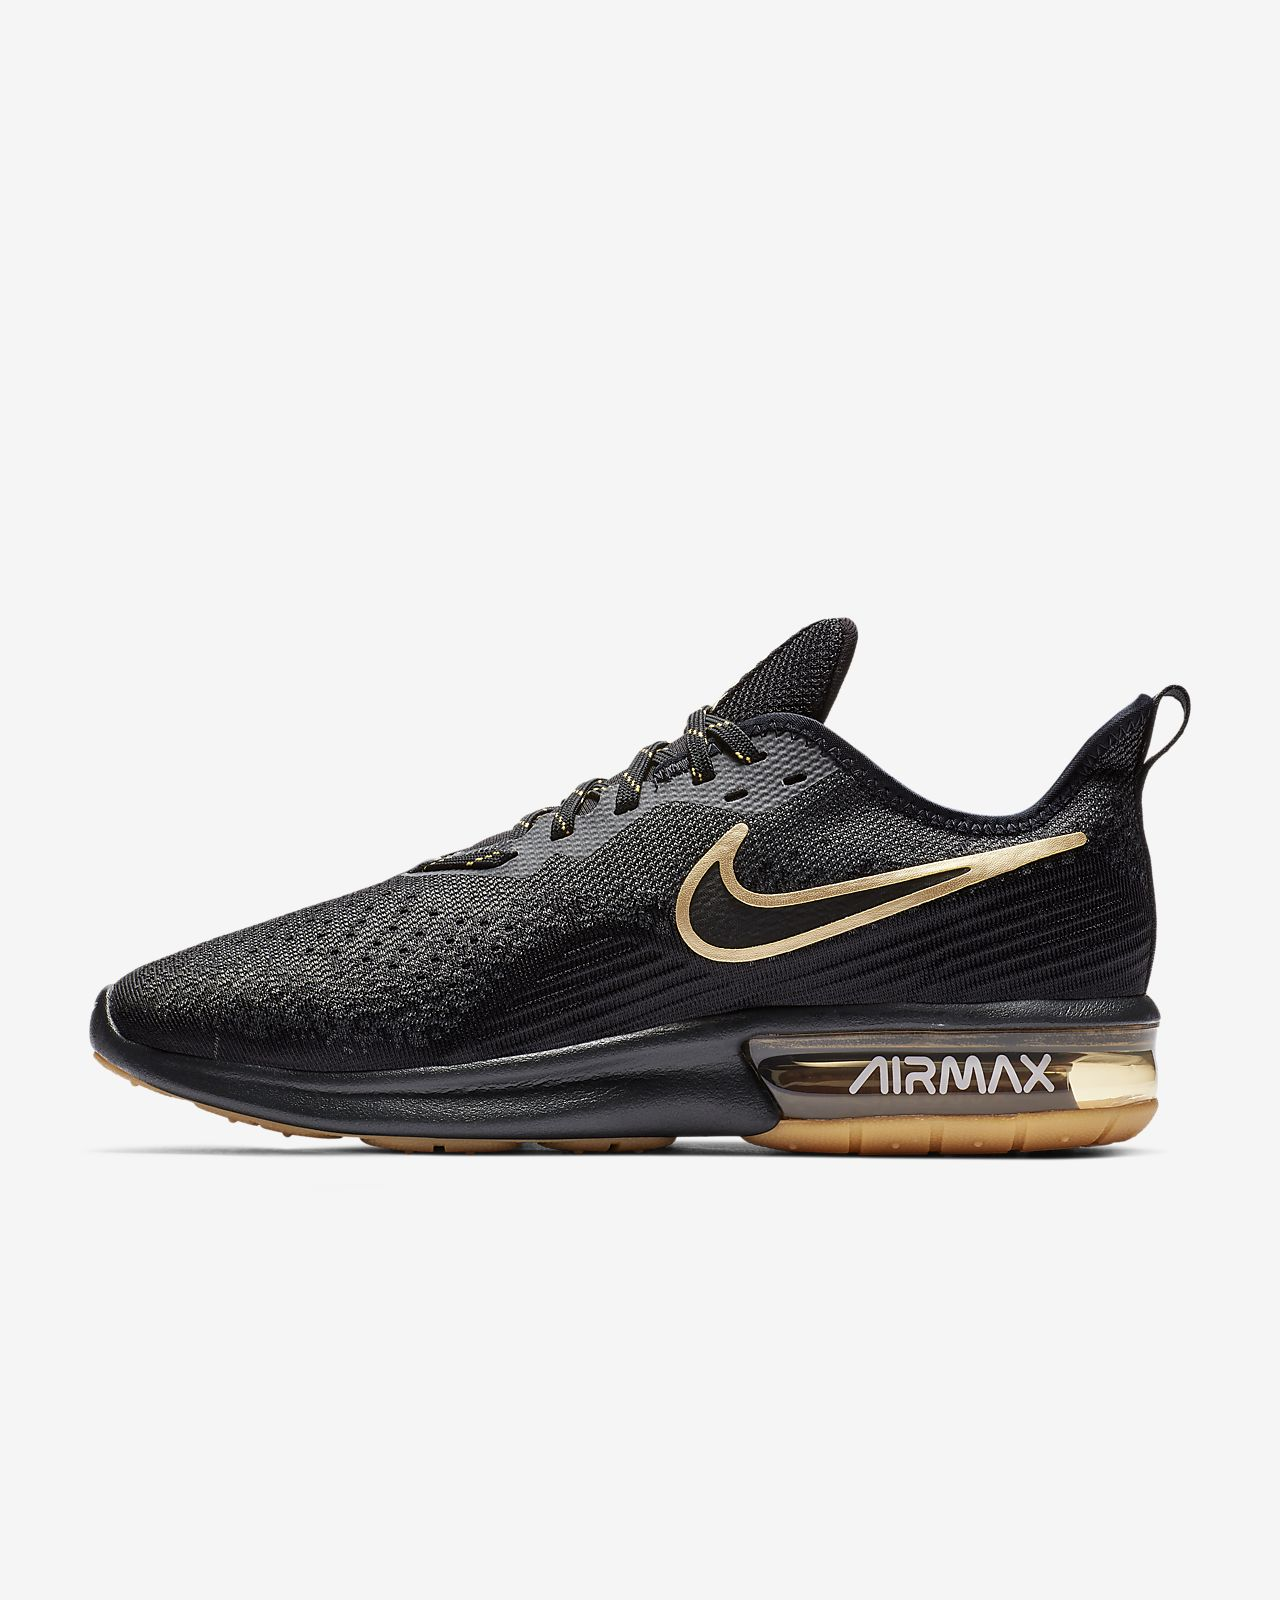 Nike Air Max Sequent 4 男子运动鞋